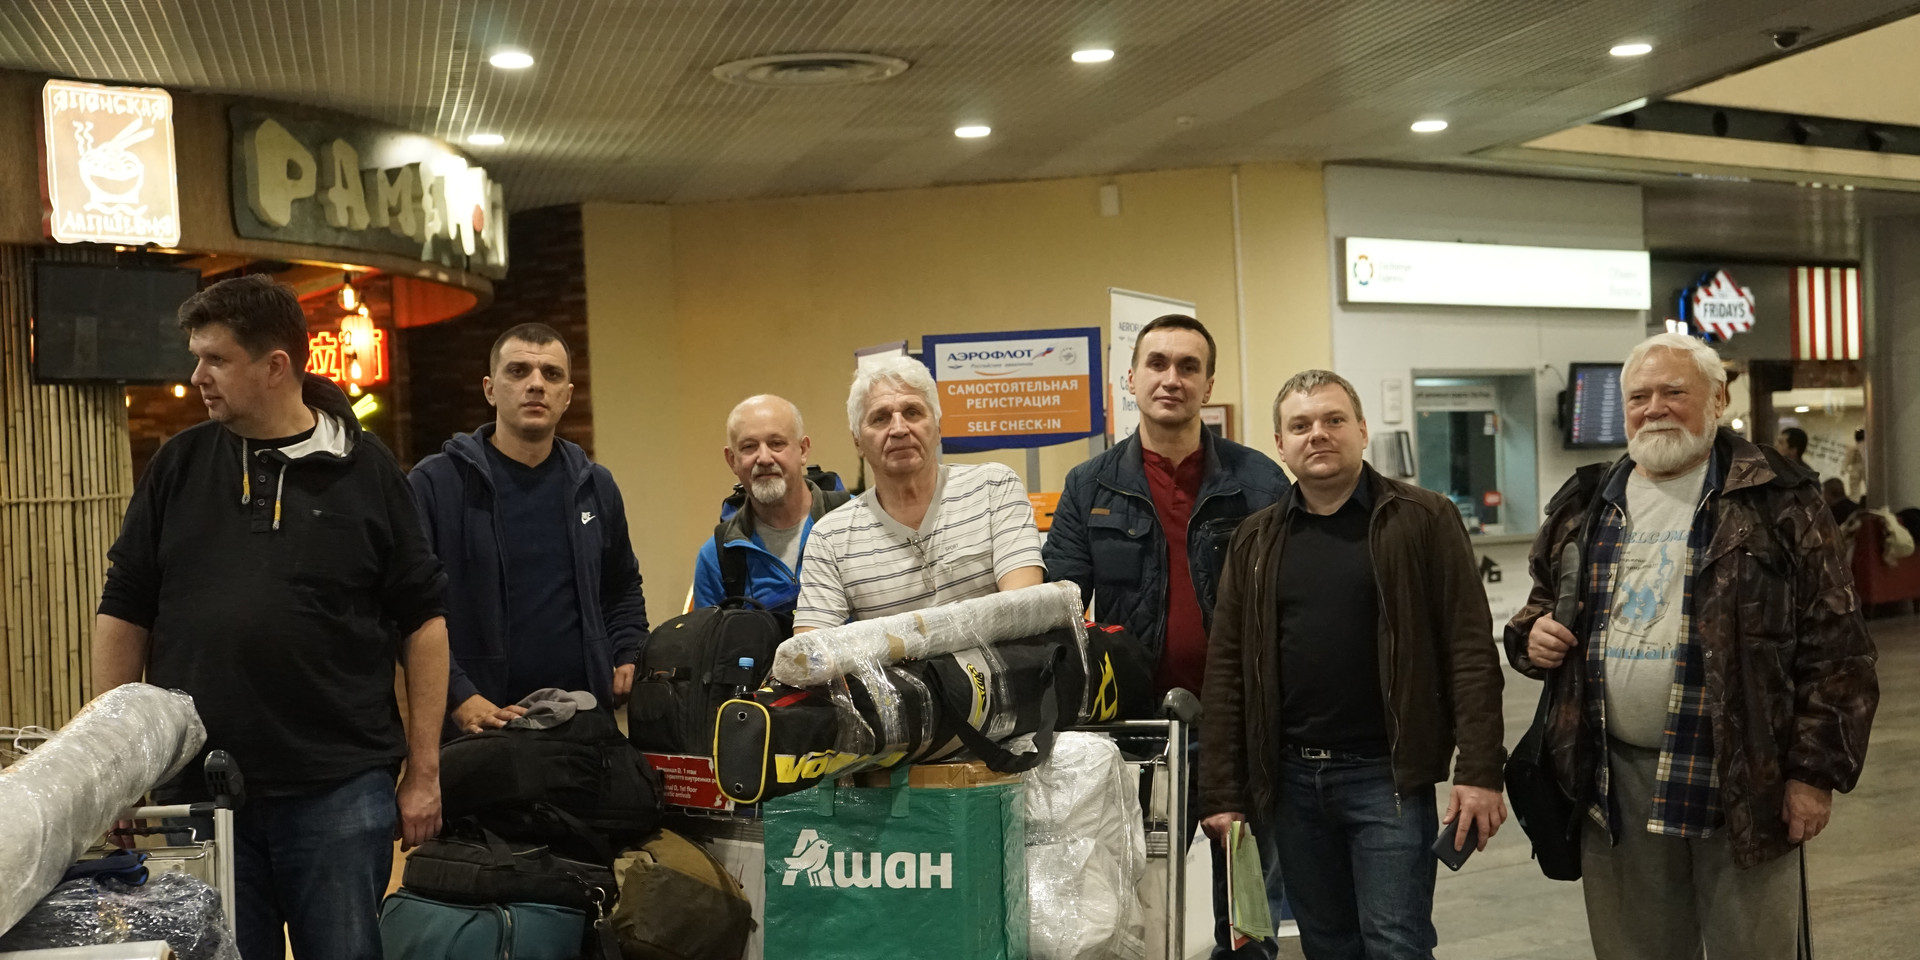 Before departure